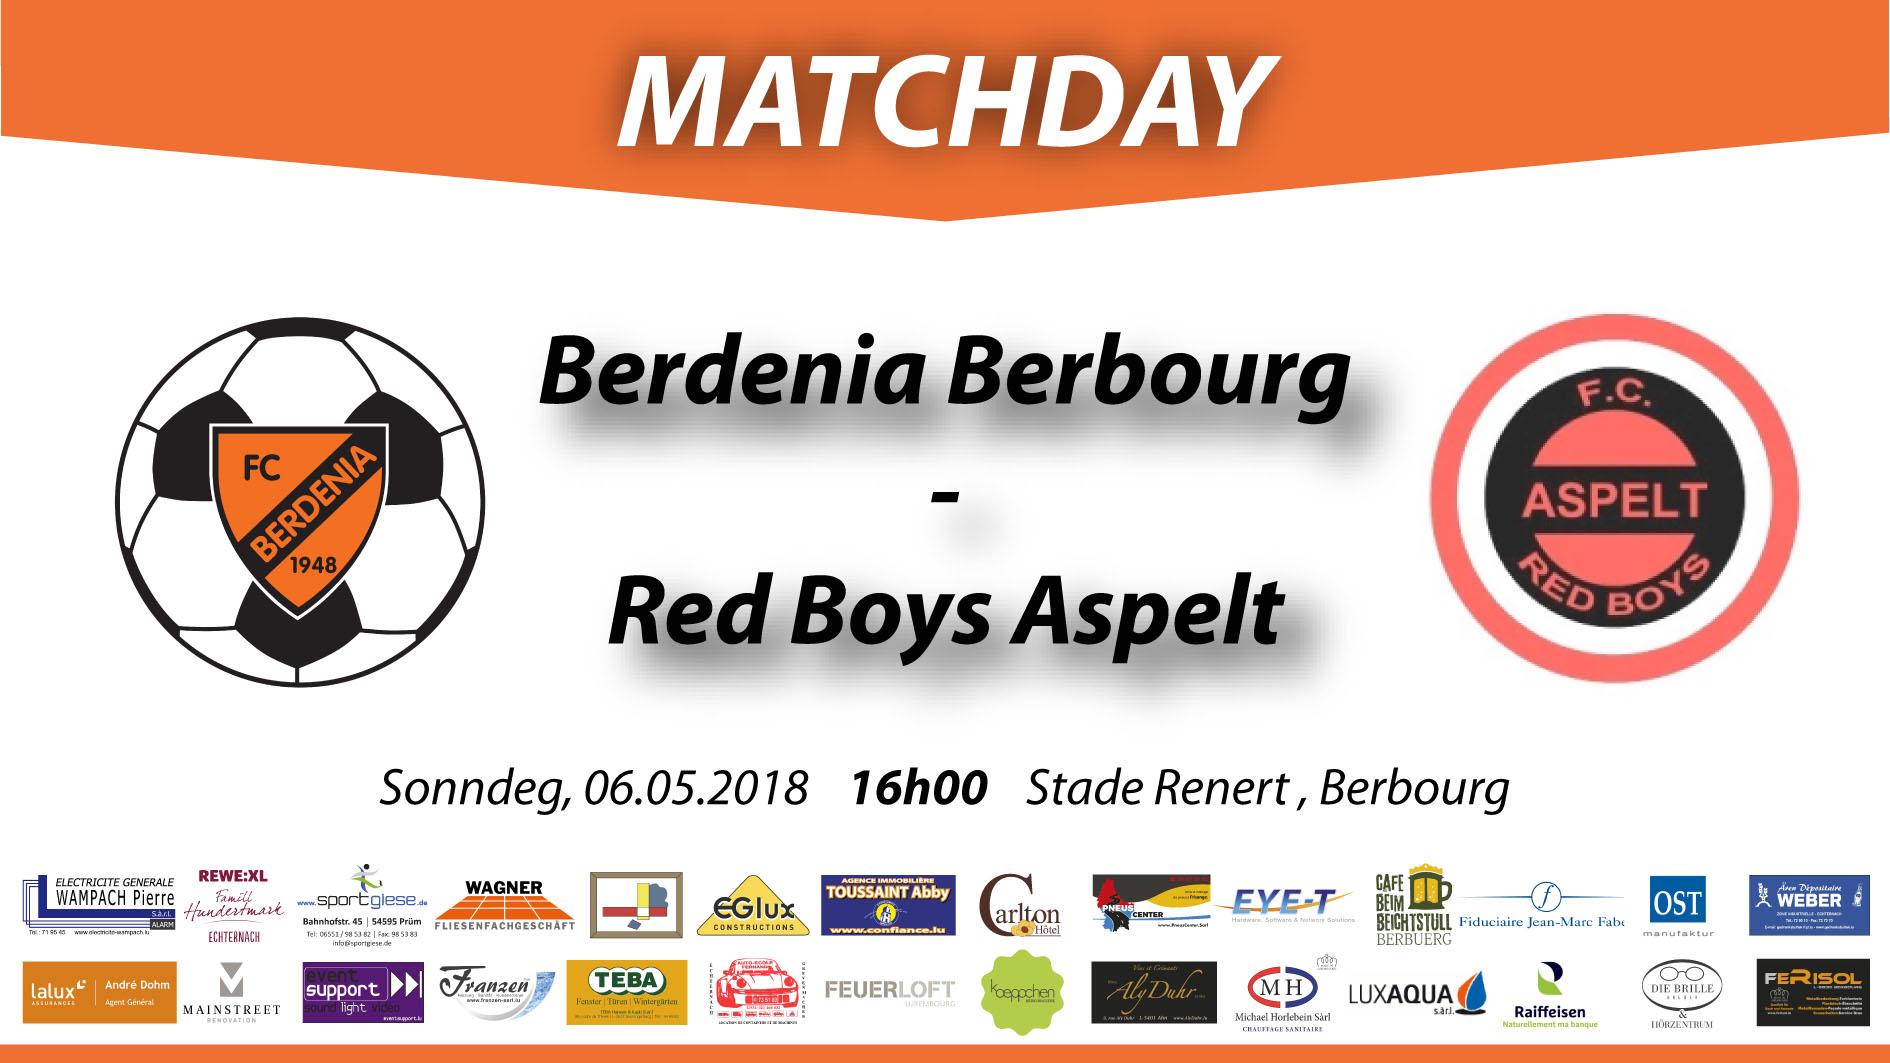 MATCHDAY: FC Berdenia Berbourg - FC Red Boys Aspelt